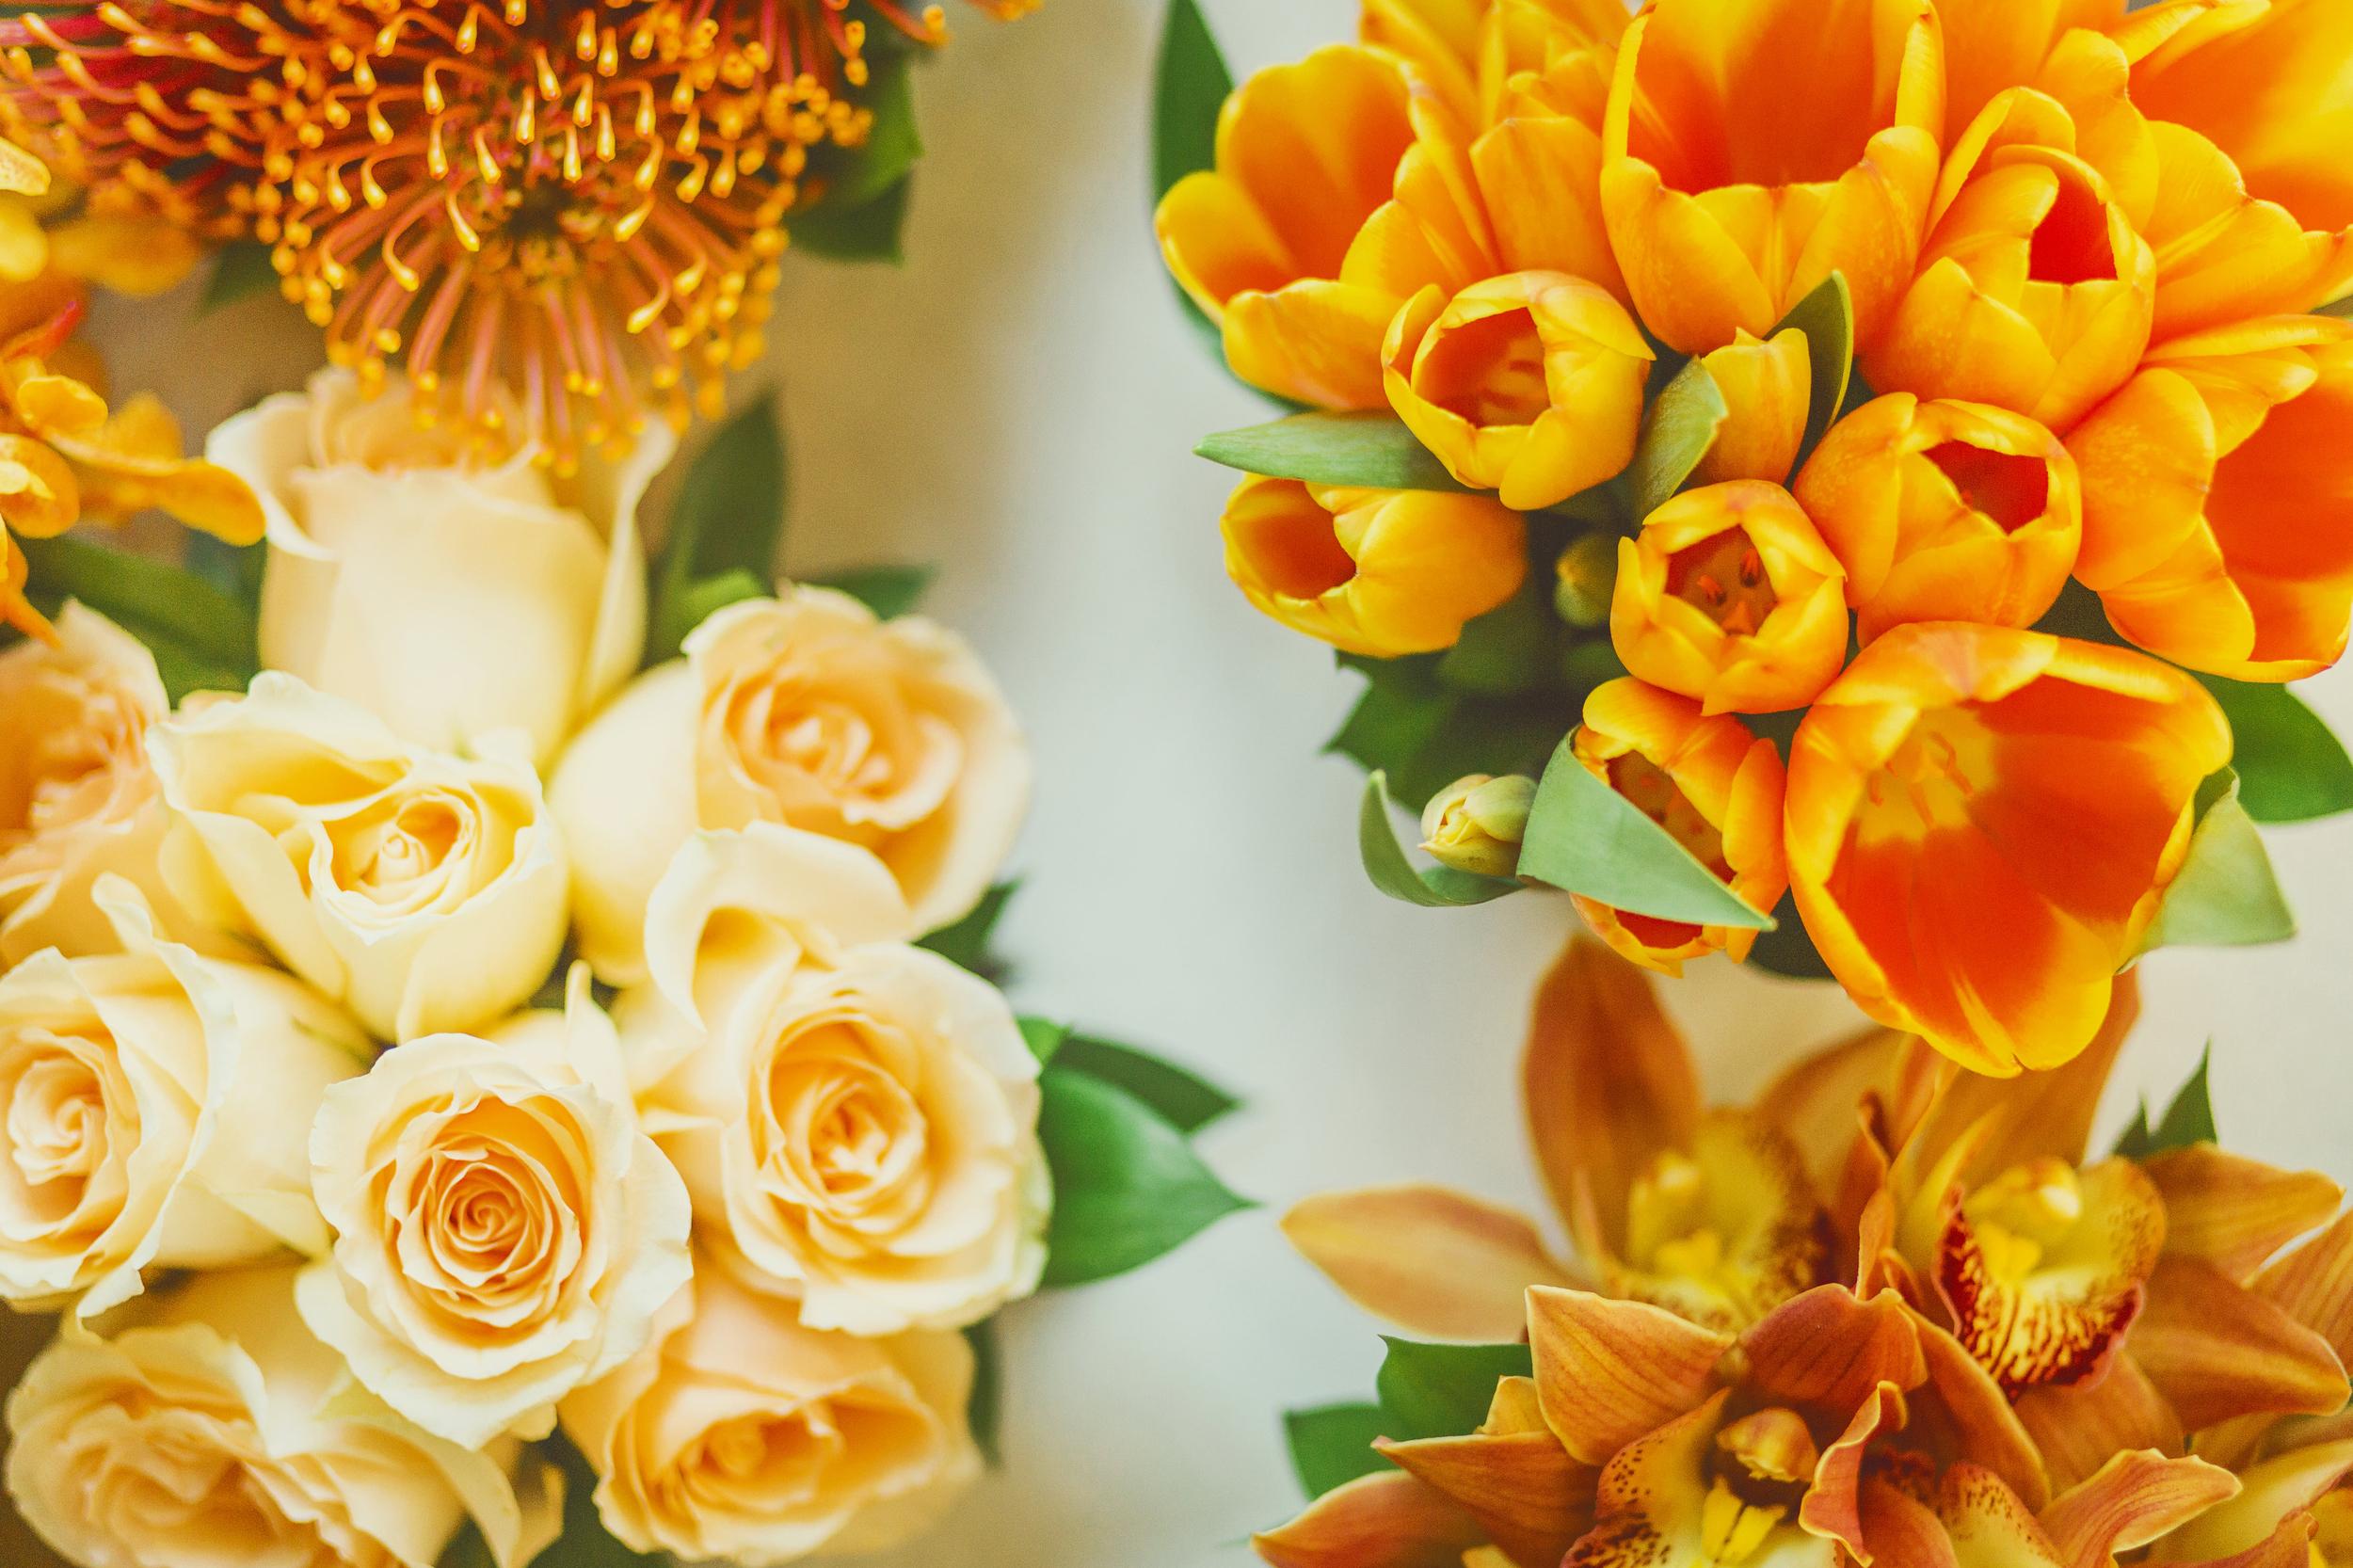 angie-diaz-photography-oahu-wedding-lanikuhonoa-shenshen-marshall-10.jpg